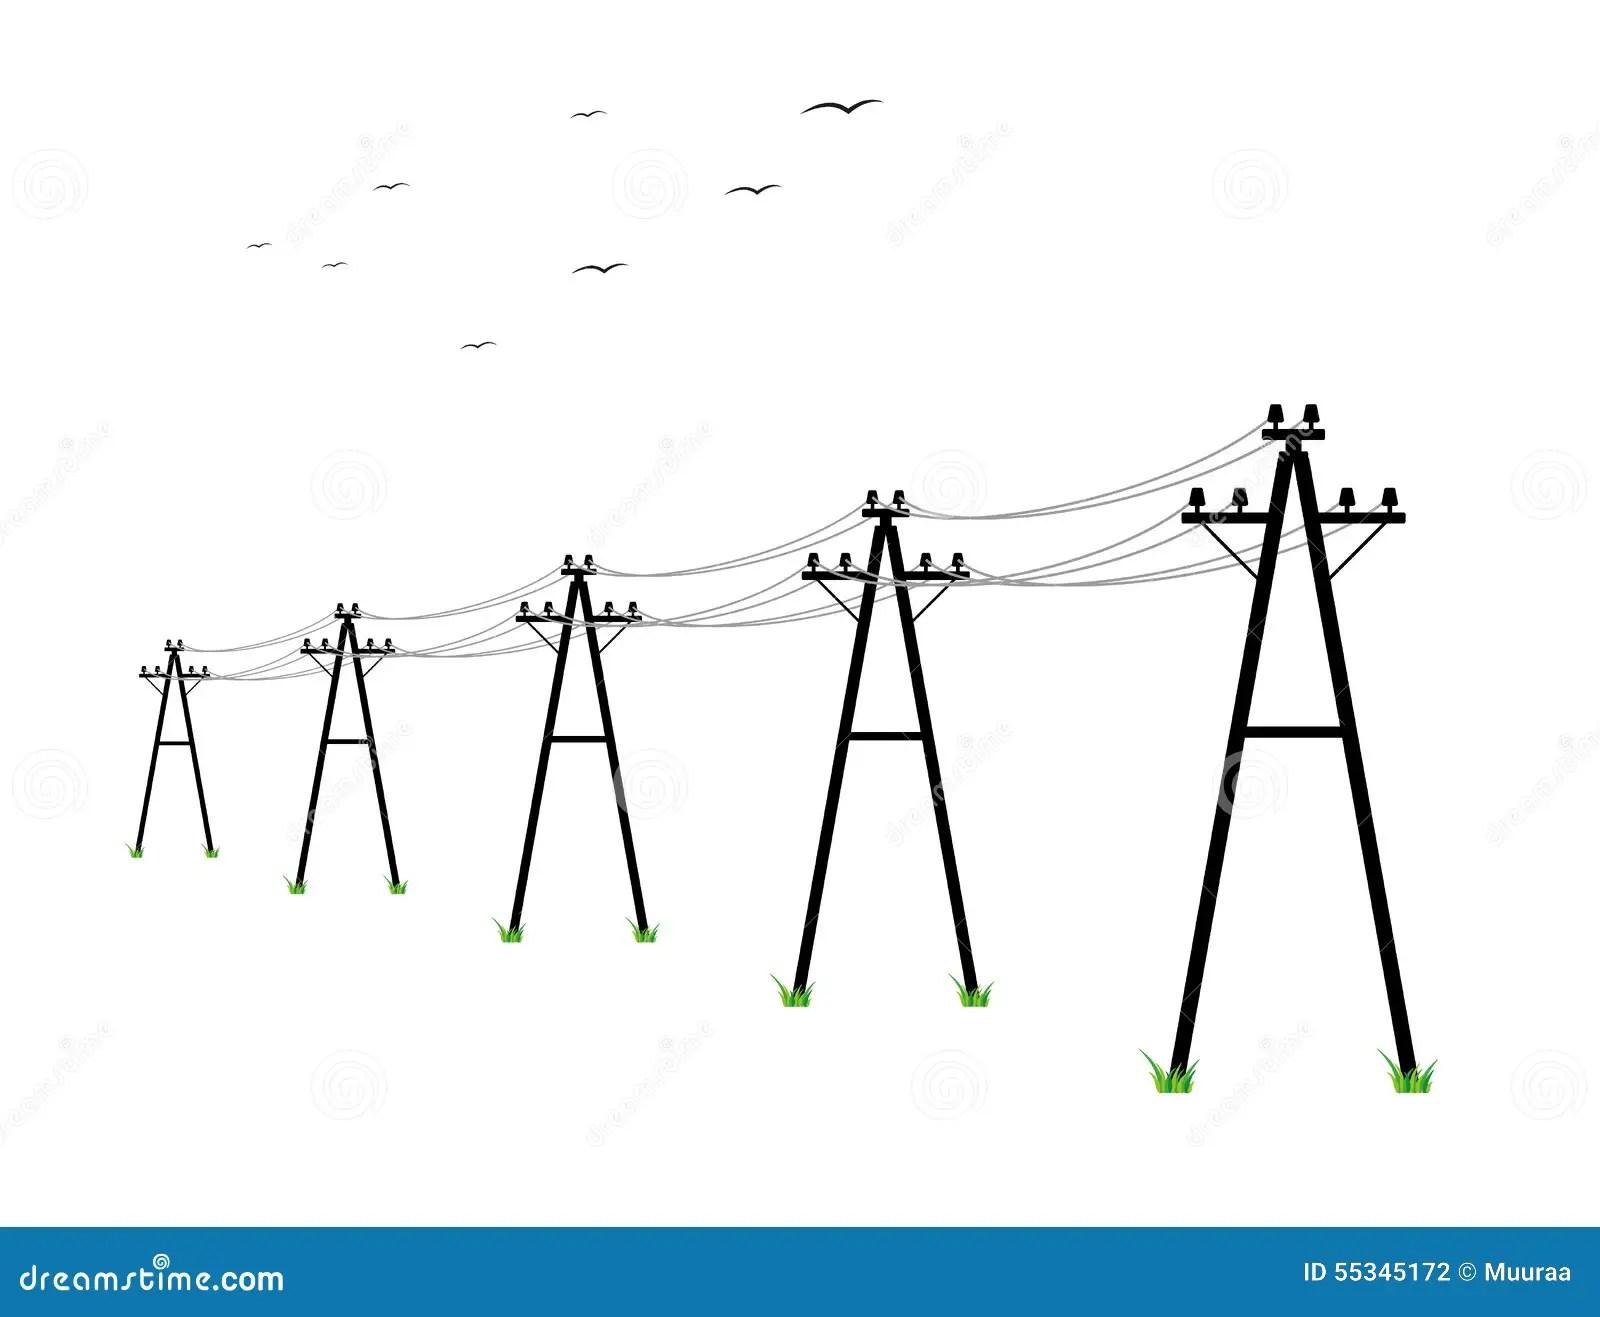 High Voltage Power Lines Stock Illustration